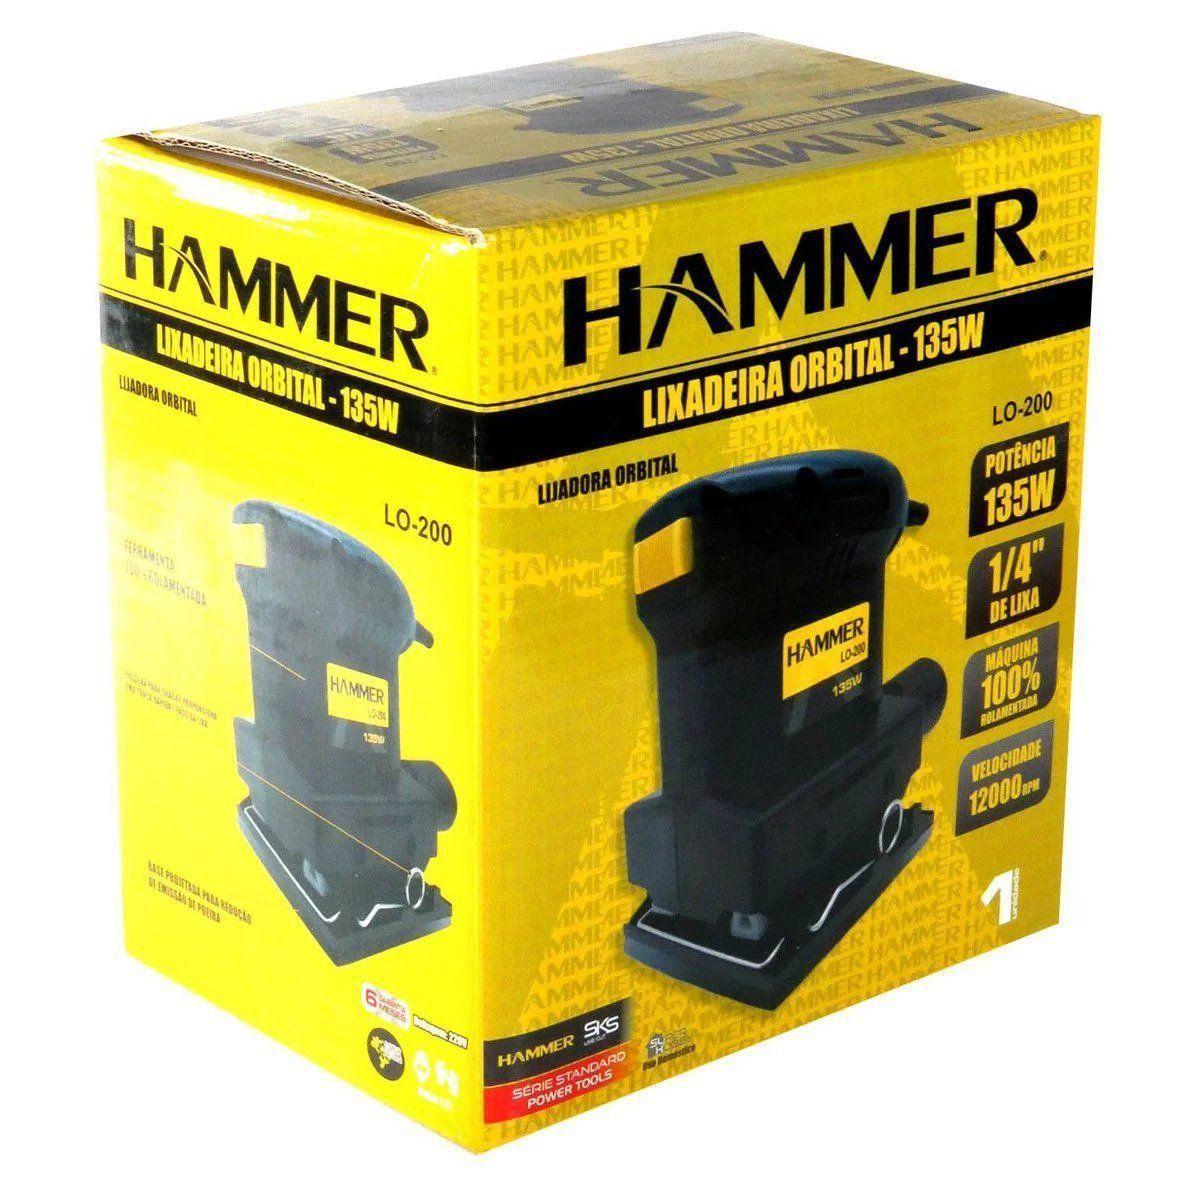 Lixadeira Orbital 1/4 Lixa Hammer 135w 12000 Rpm LO-200  - 220 v  - EMPORIO K